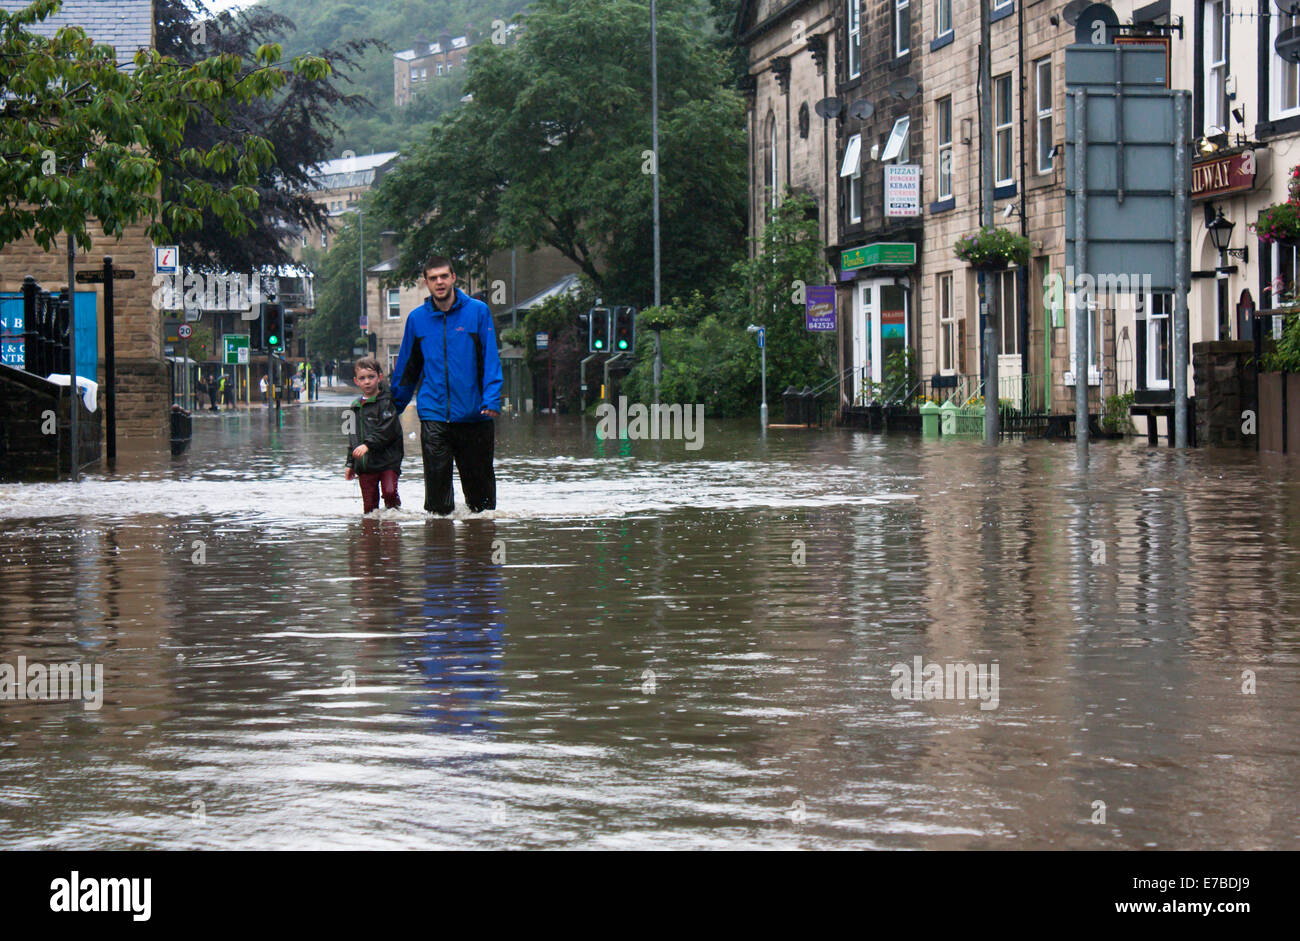 Man and boy wading through flood waters, Hebden Bridge, West Yorkshire, UK Stock Photo